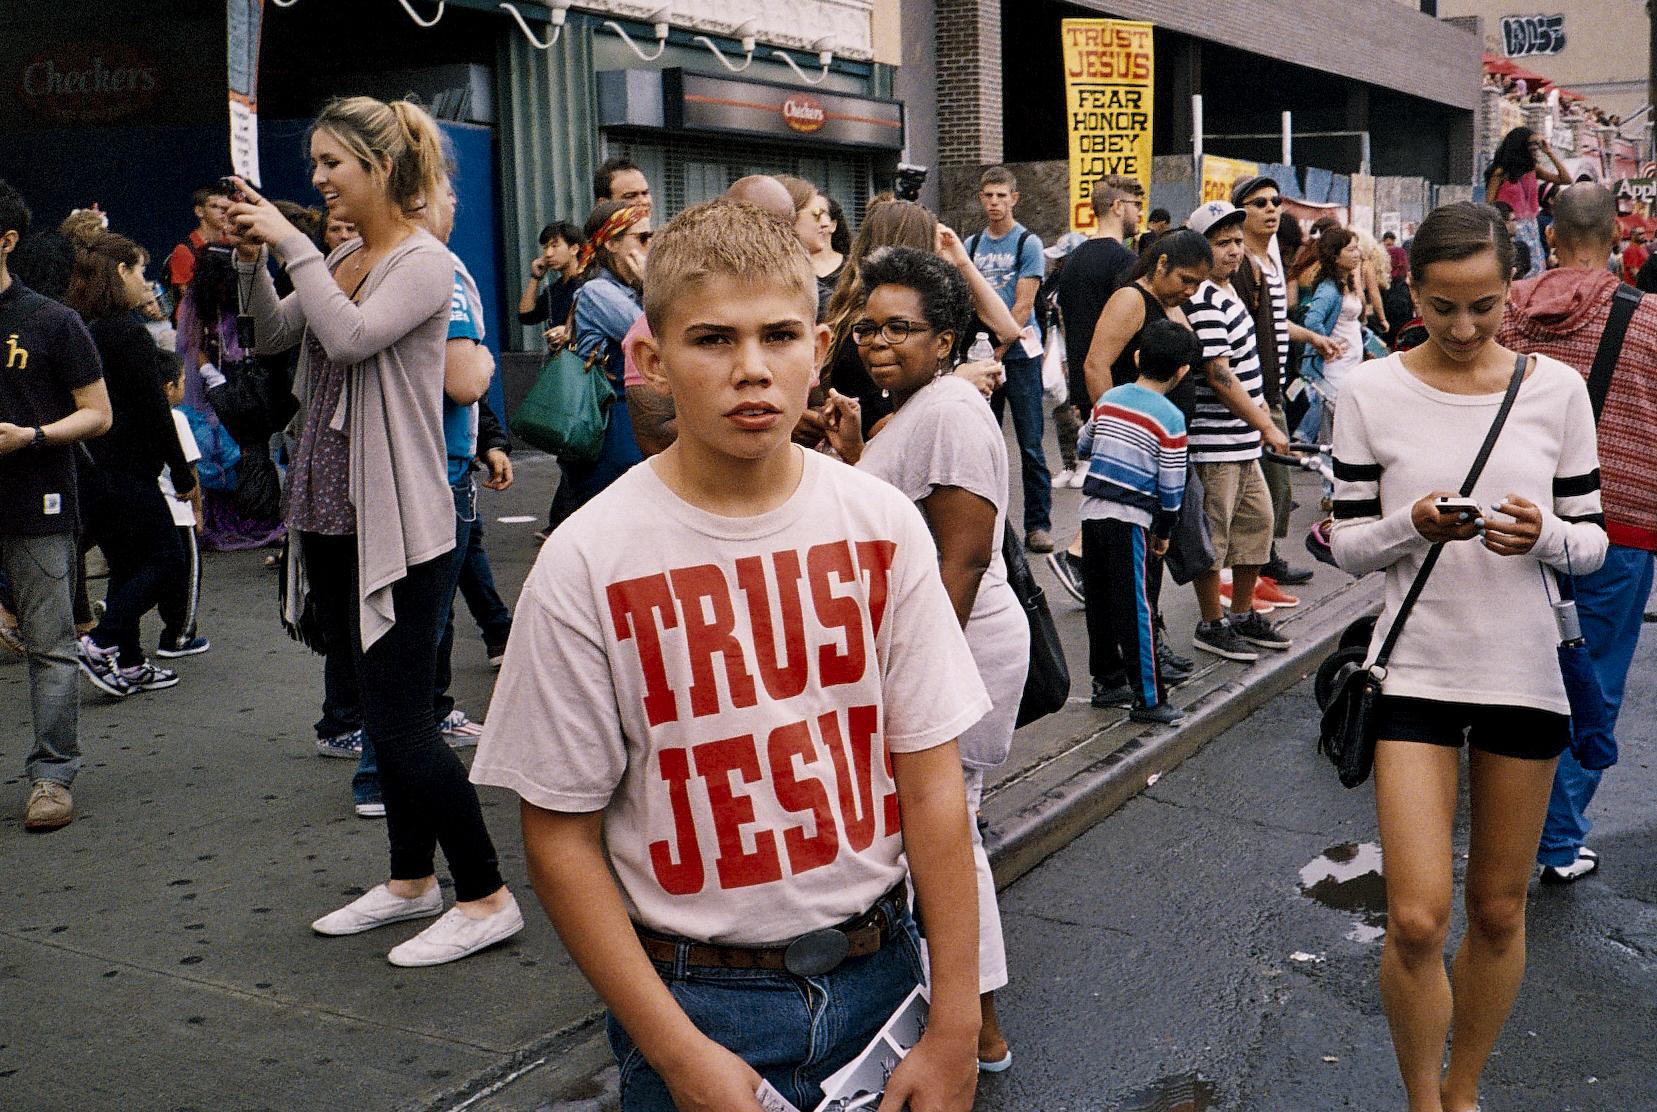 new-york-city-street-photography-chris-voss-6